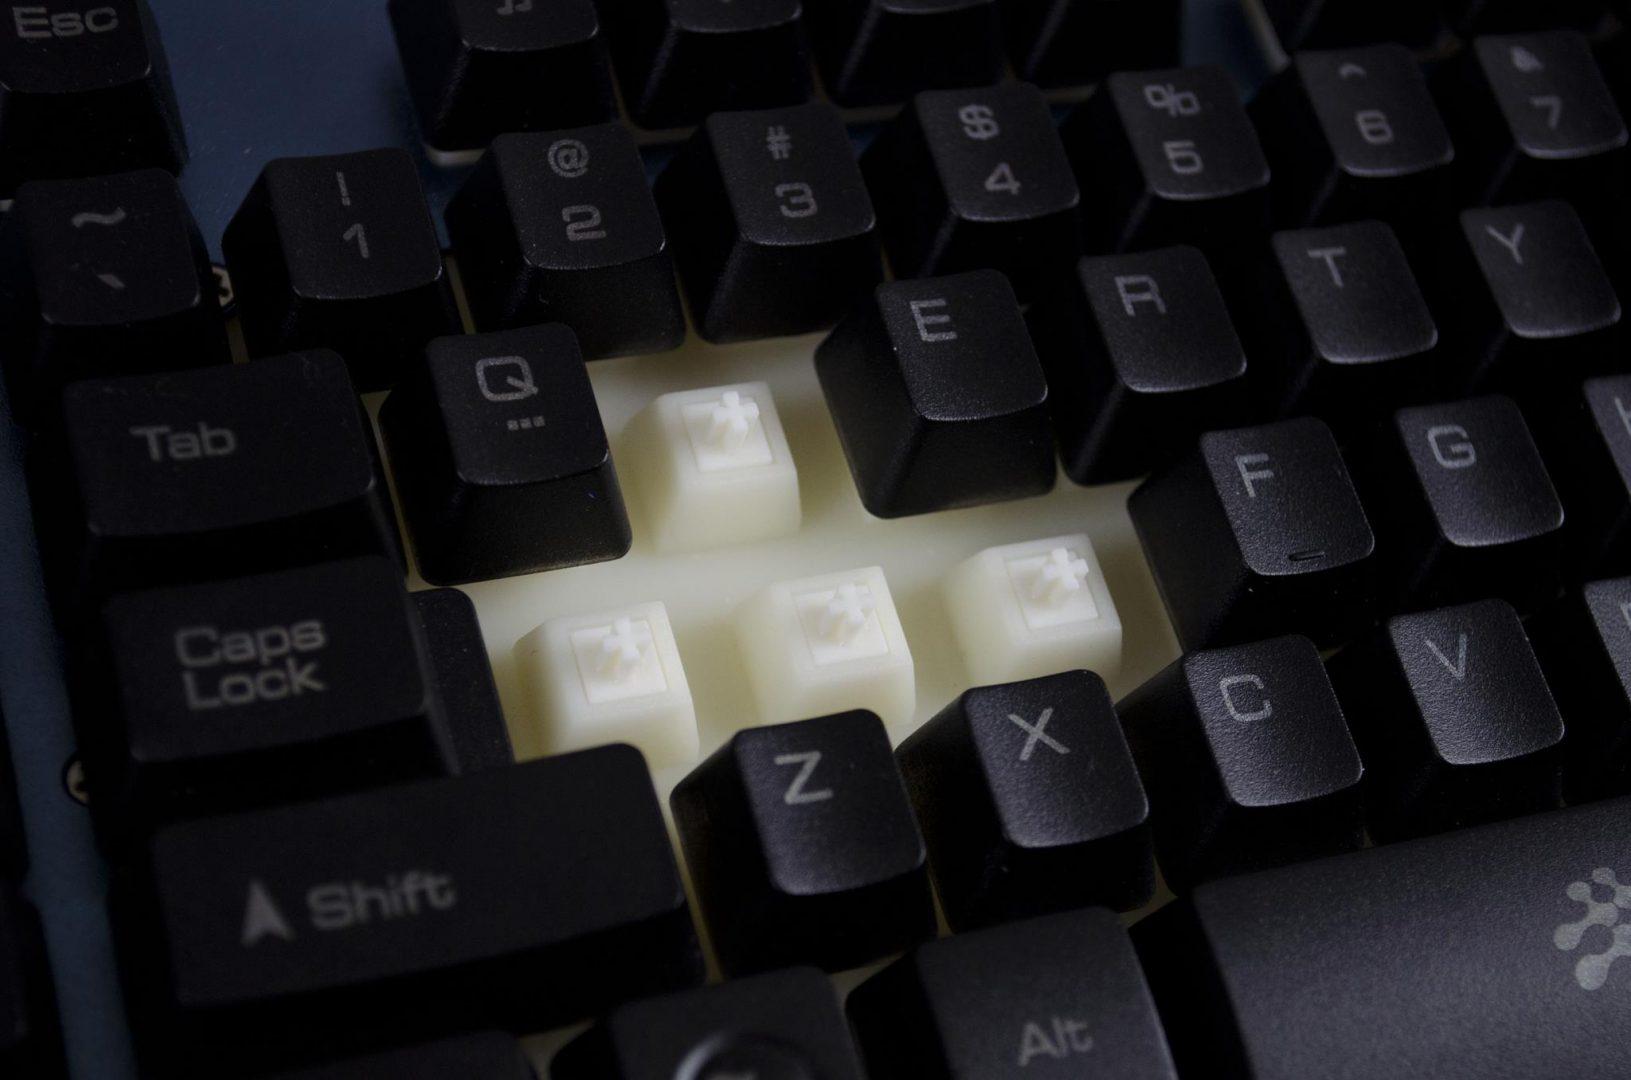 Azolt gCrusayder keyboard review_10